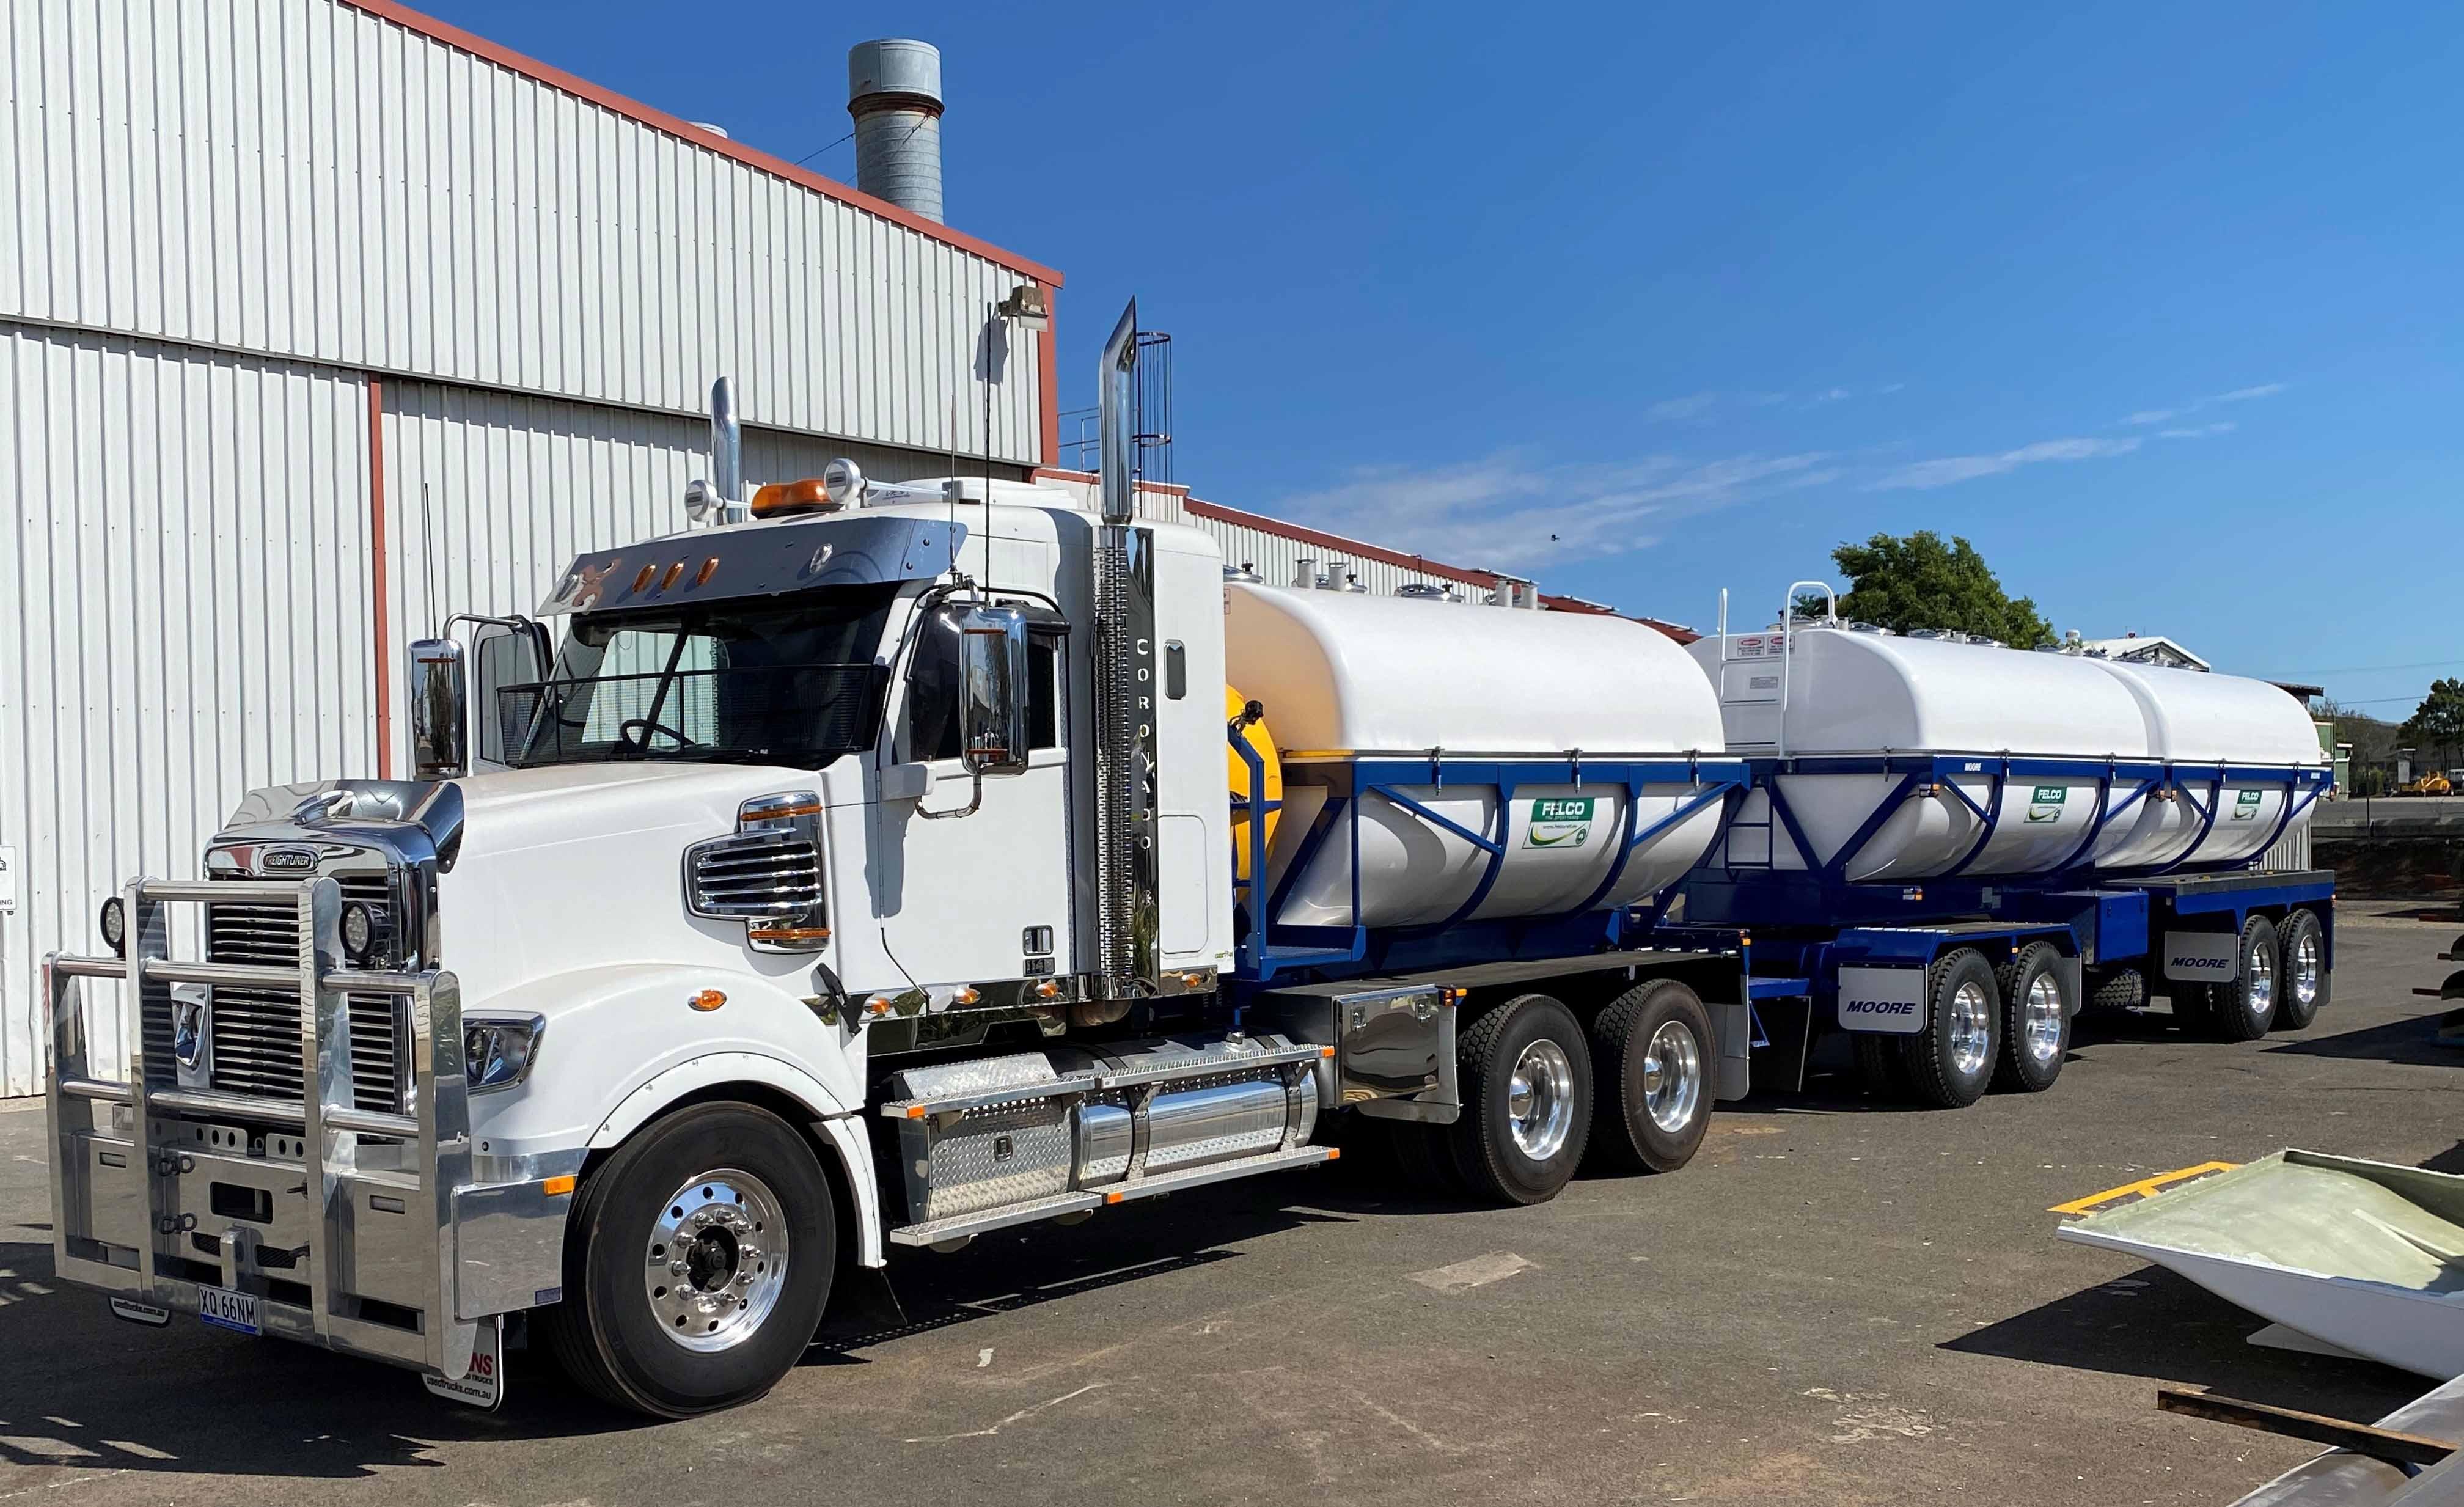 Truck and Super Dog On Farm Molasses Tan